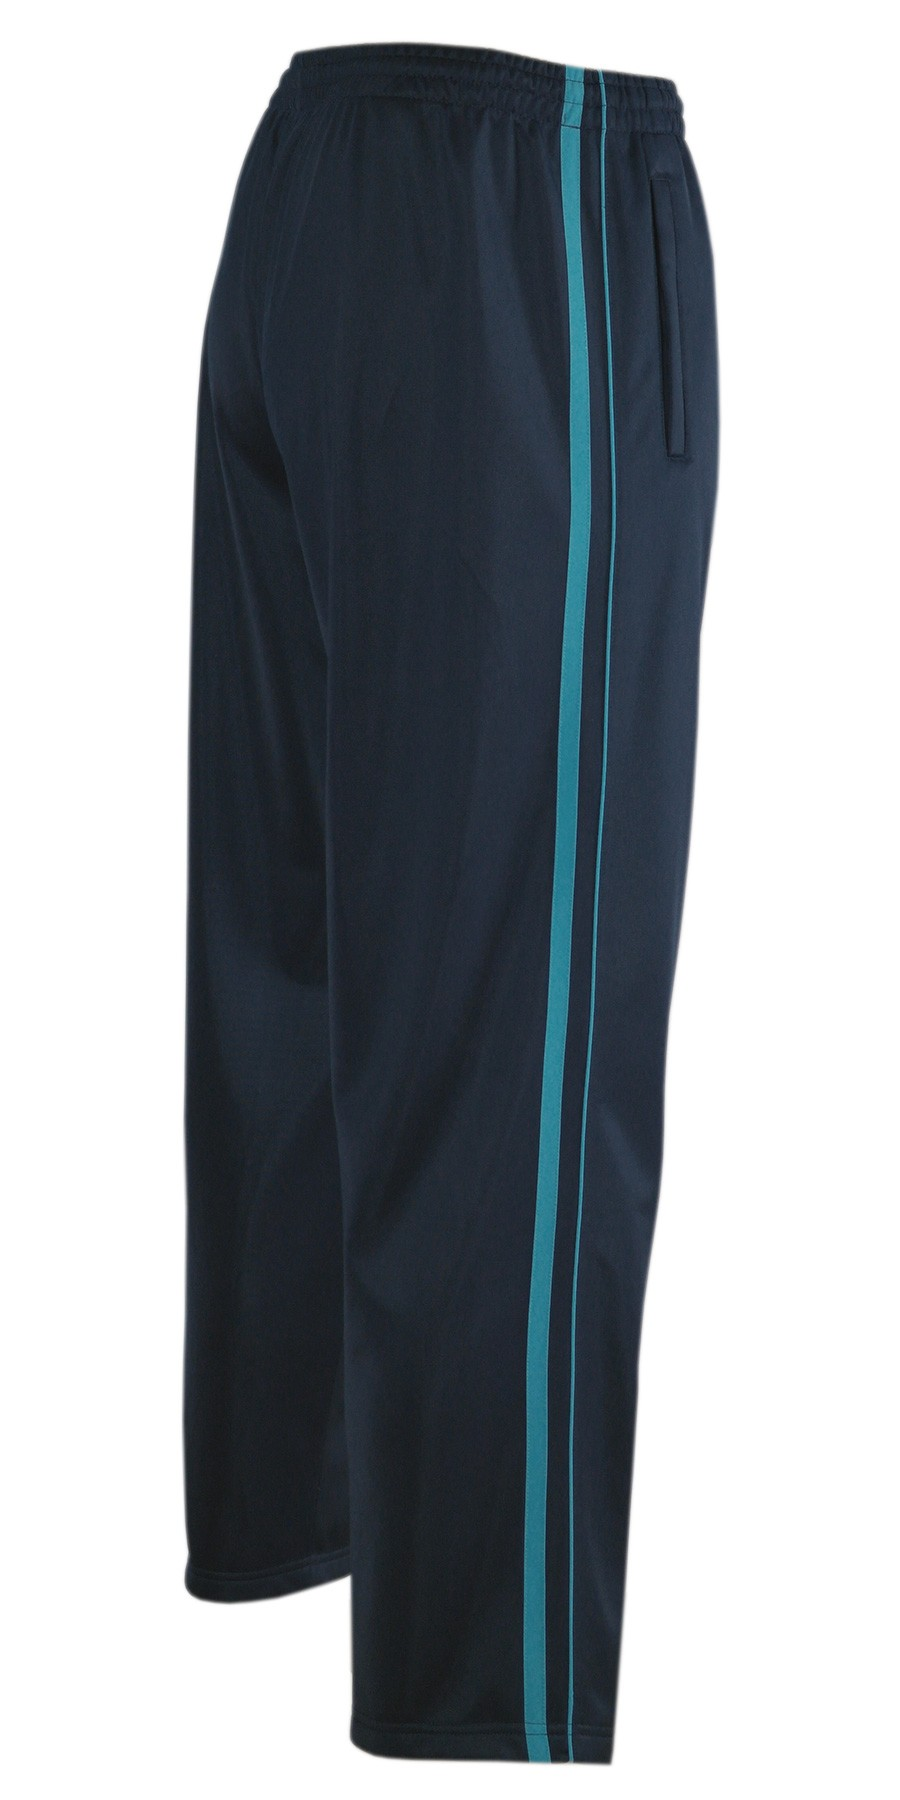 Jogginghose, Sport- Freizeithose offener Saum K-Größen - Navy/türkis